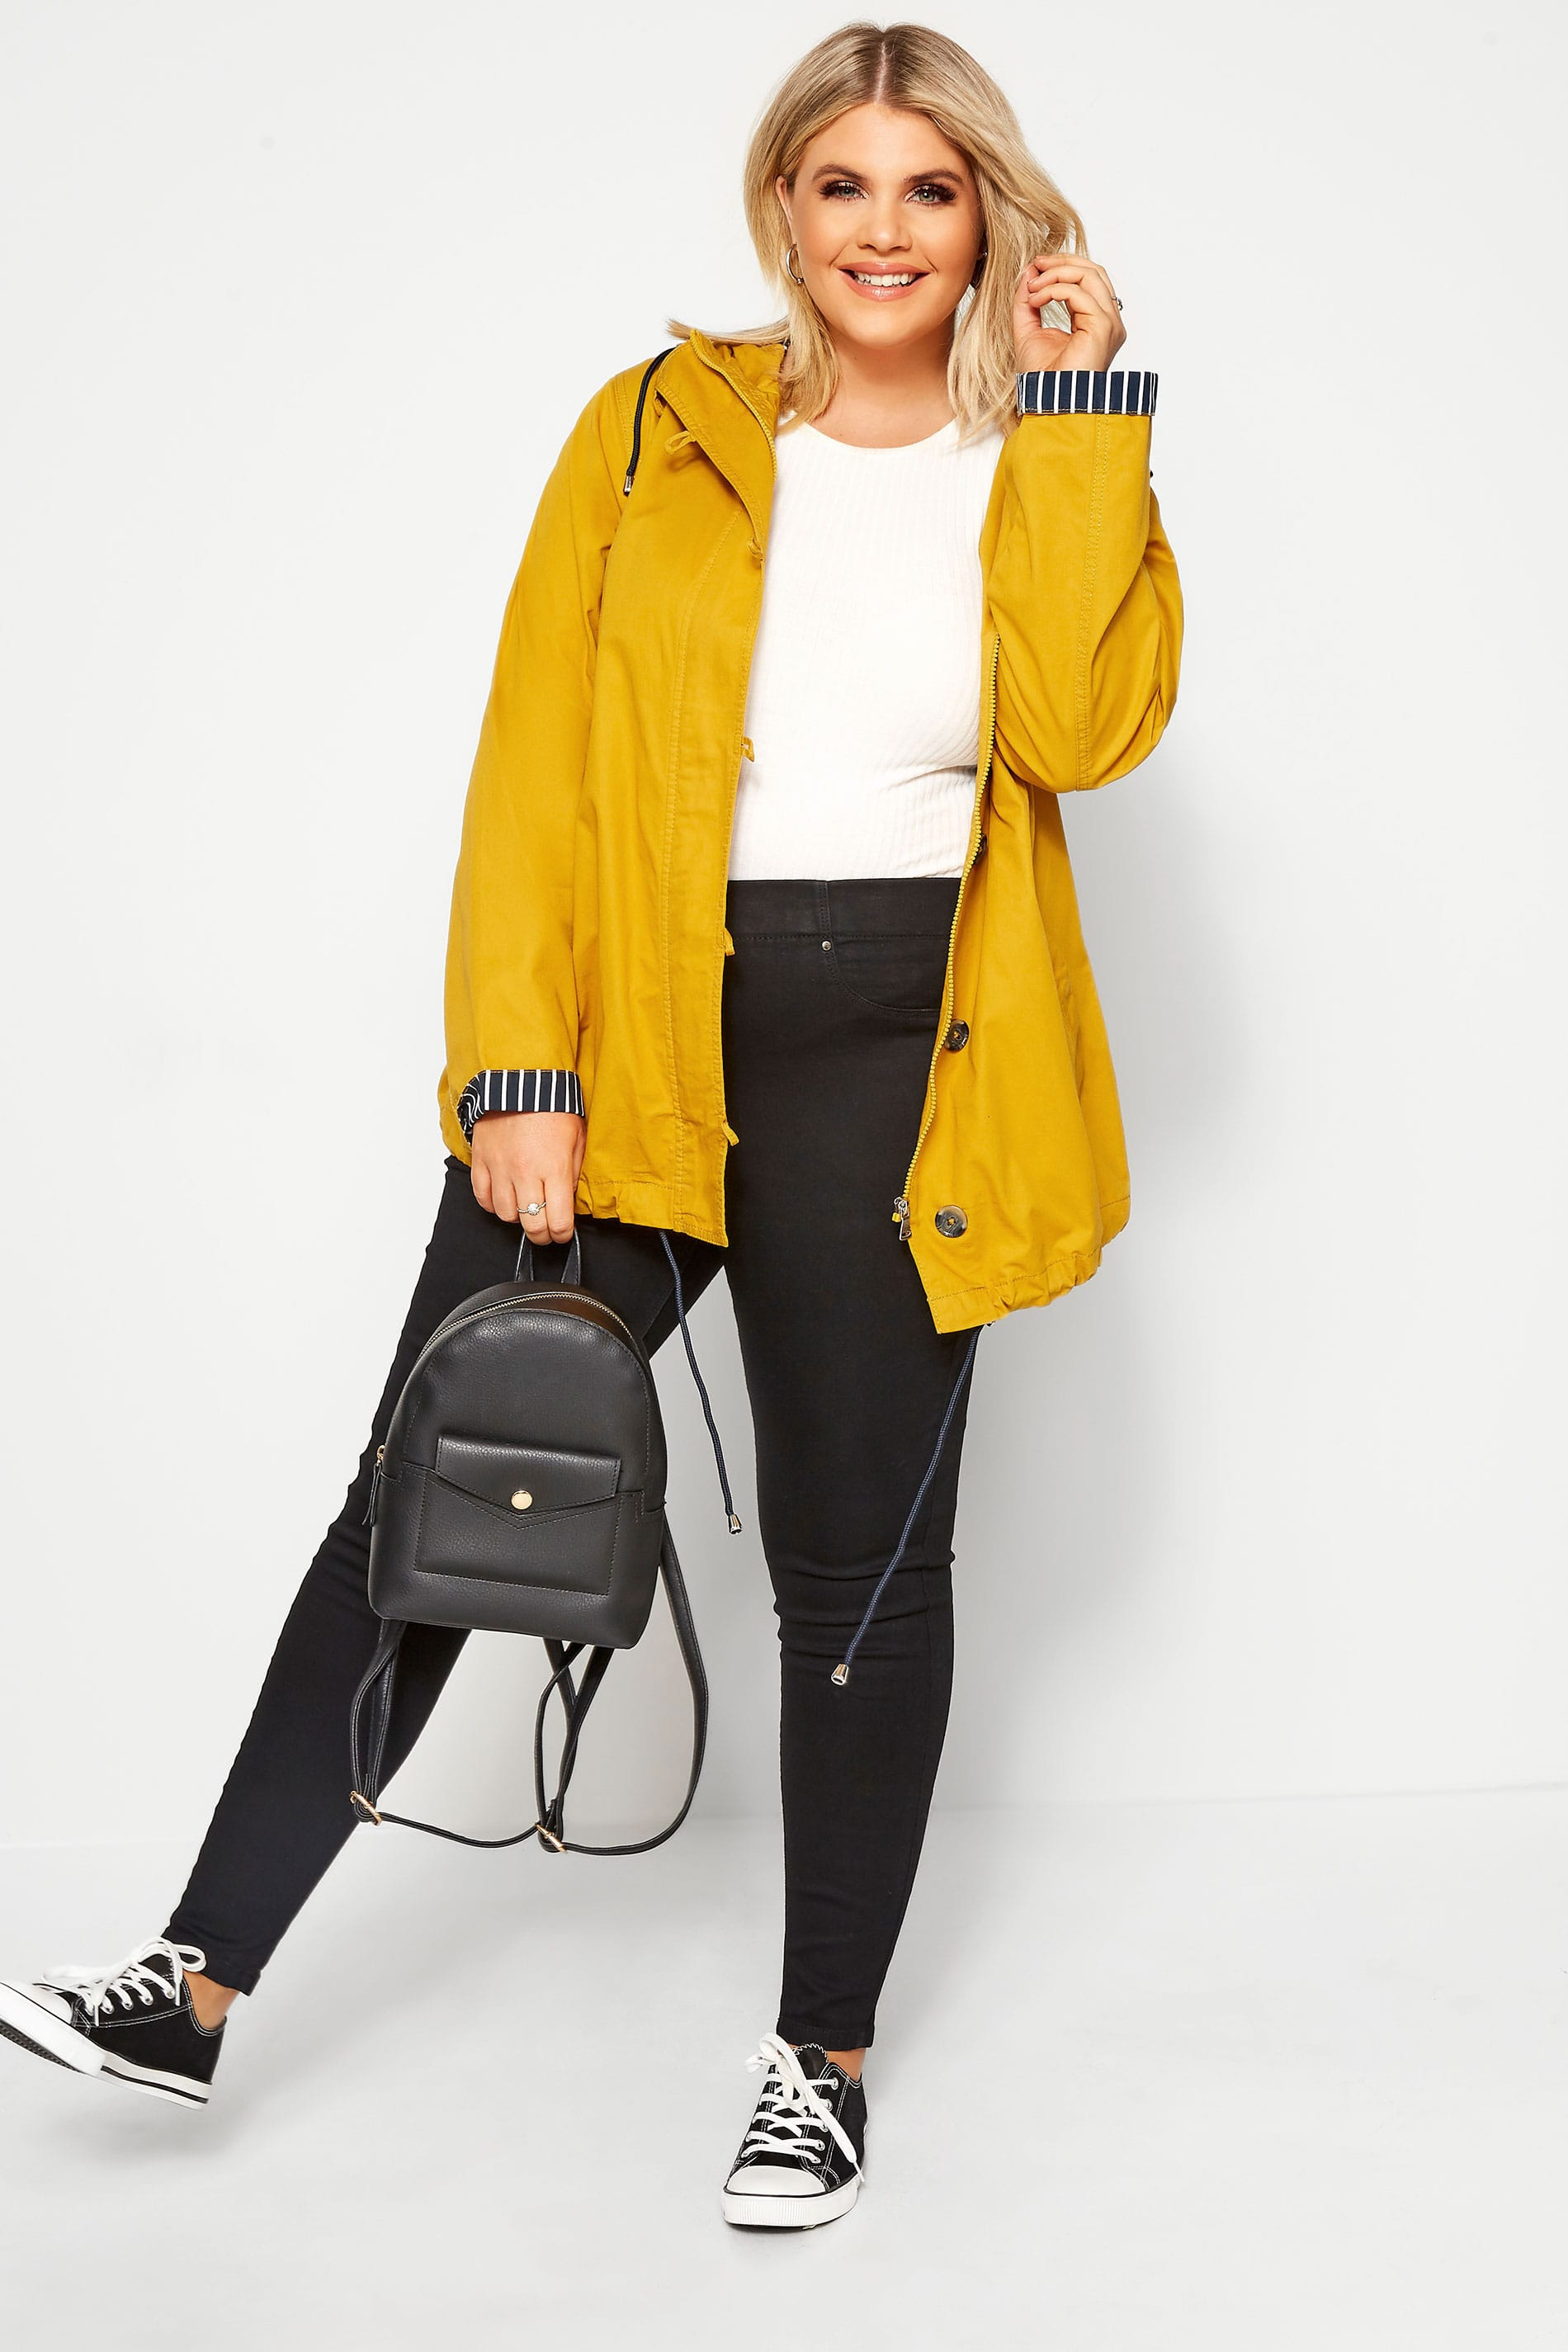 Mustard Yellow Twill Parka Jacket